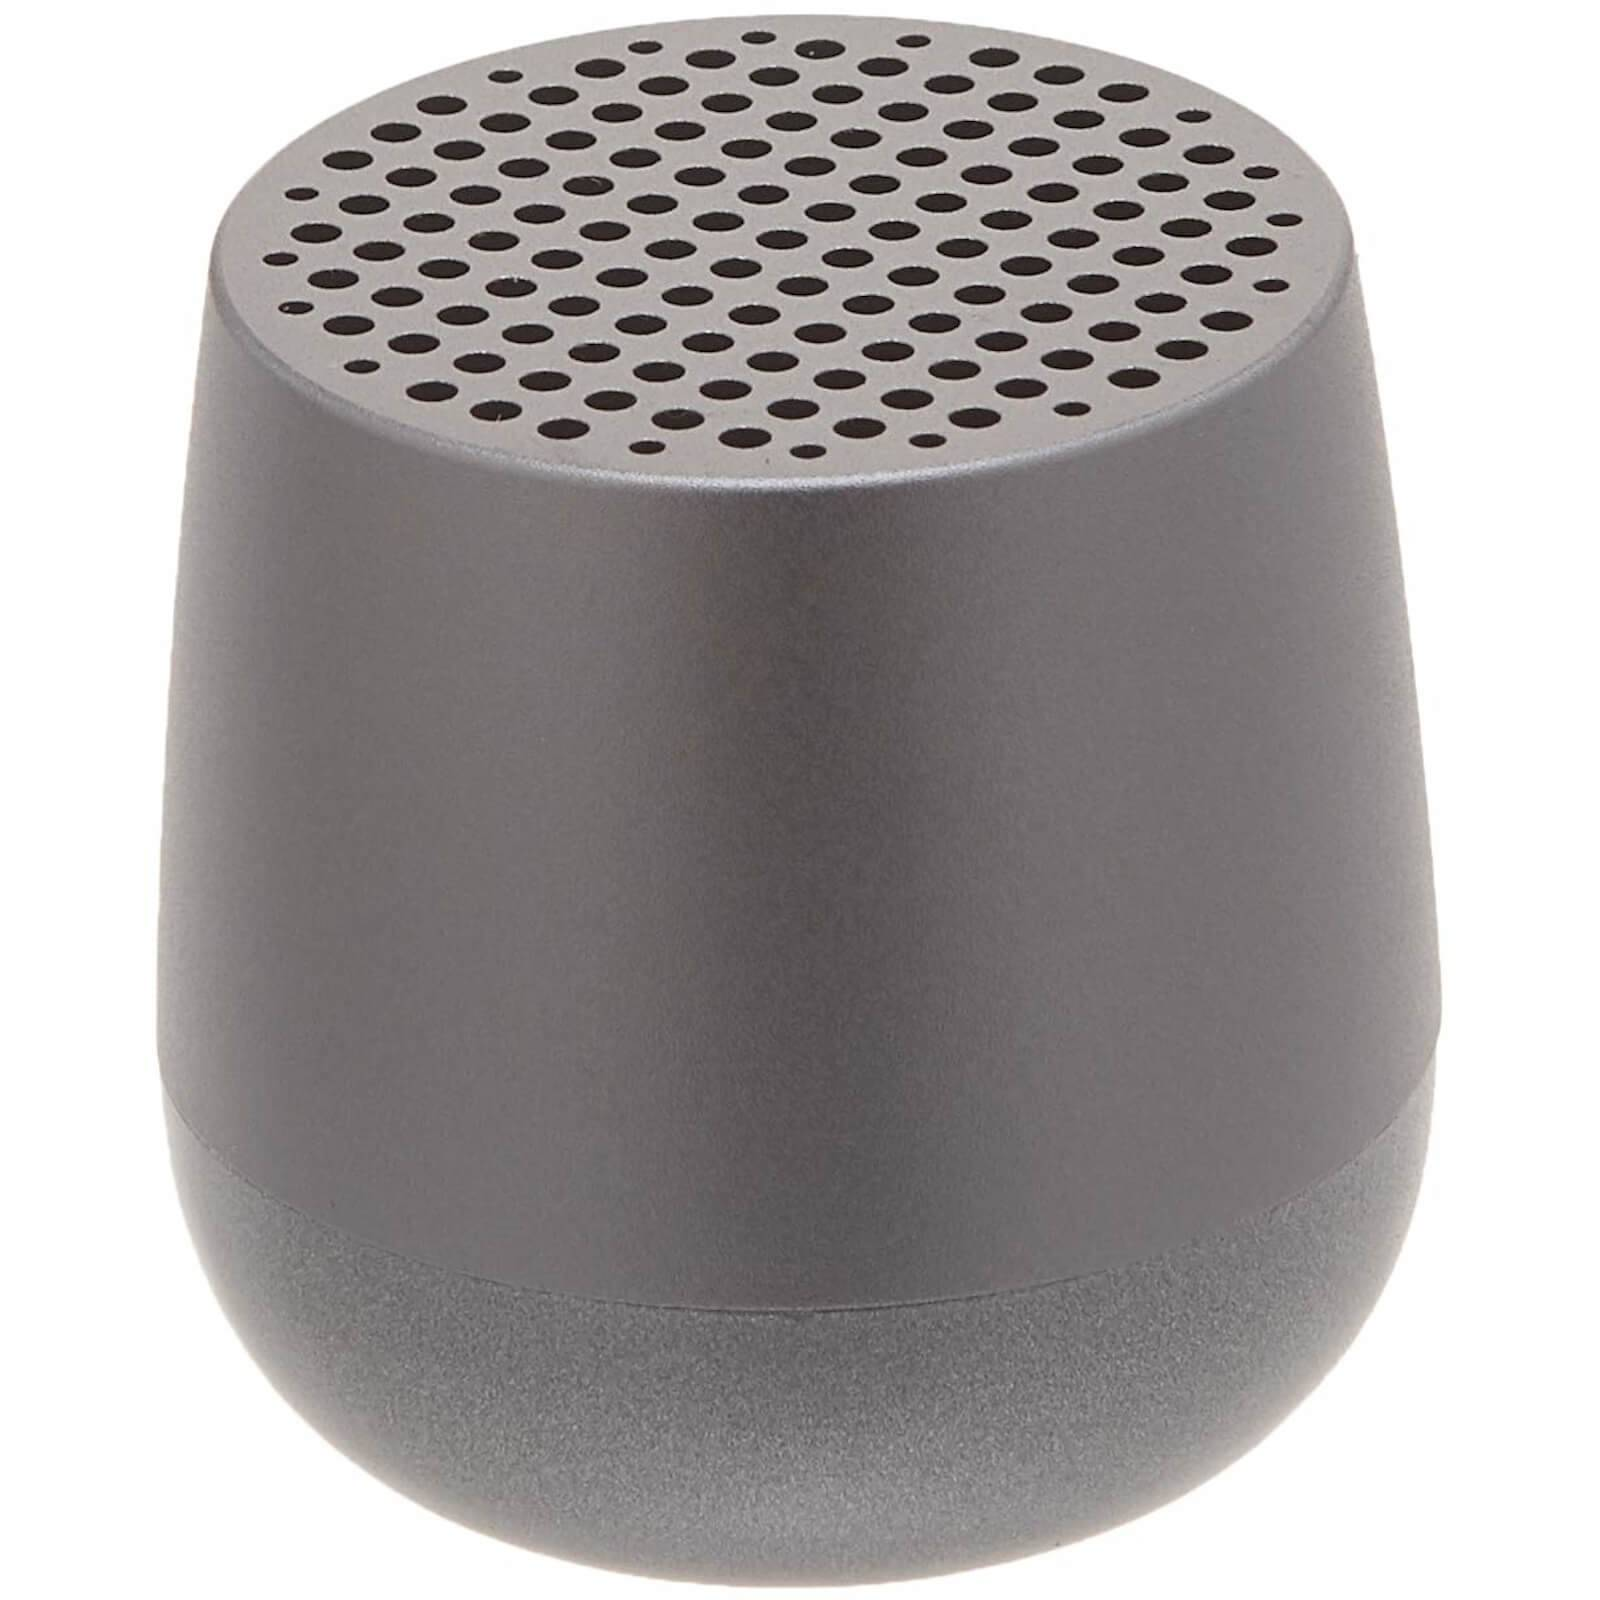 Lexon MINO Bluetooth Speaker - Gun Metal